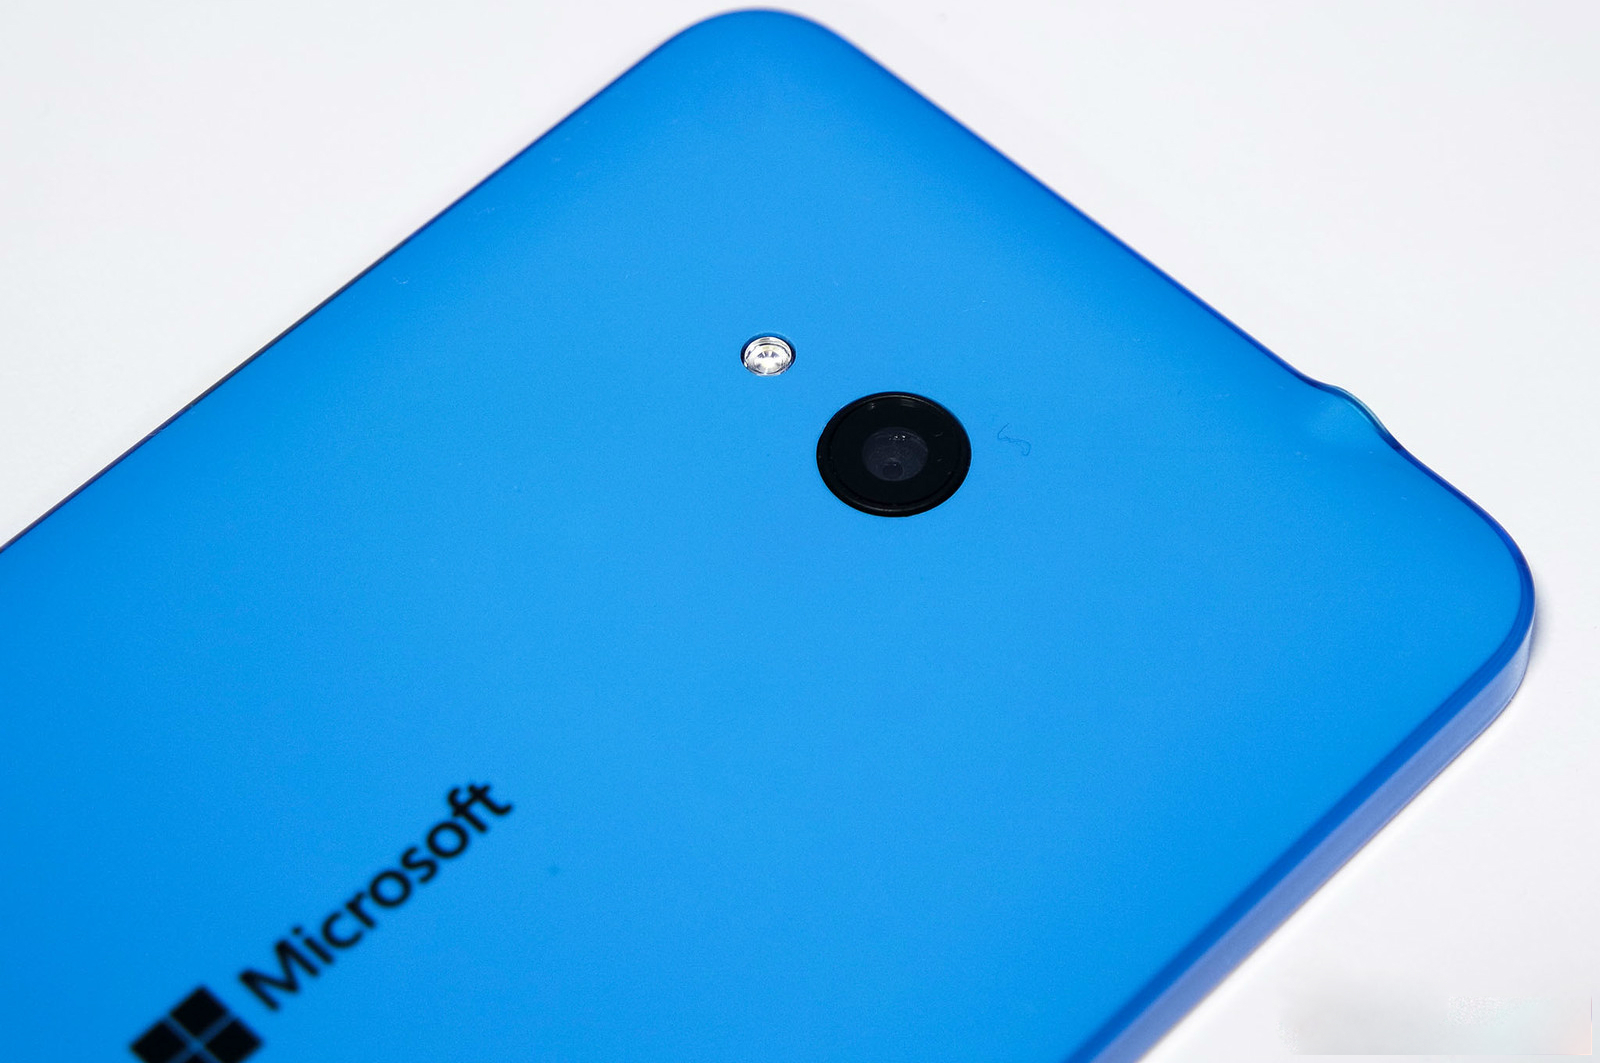 Lumia 640 incorpora un sensor de 8 megapixeles con flash